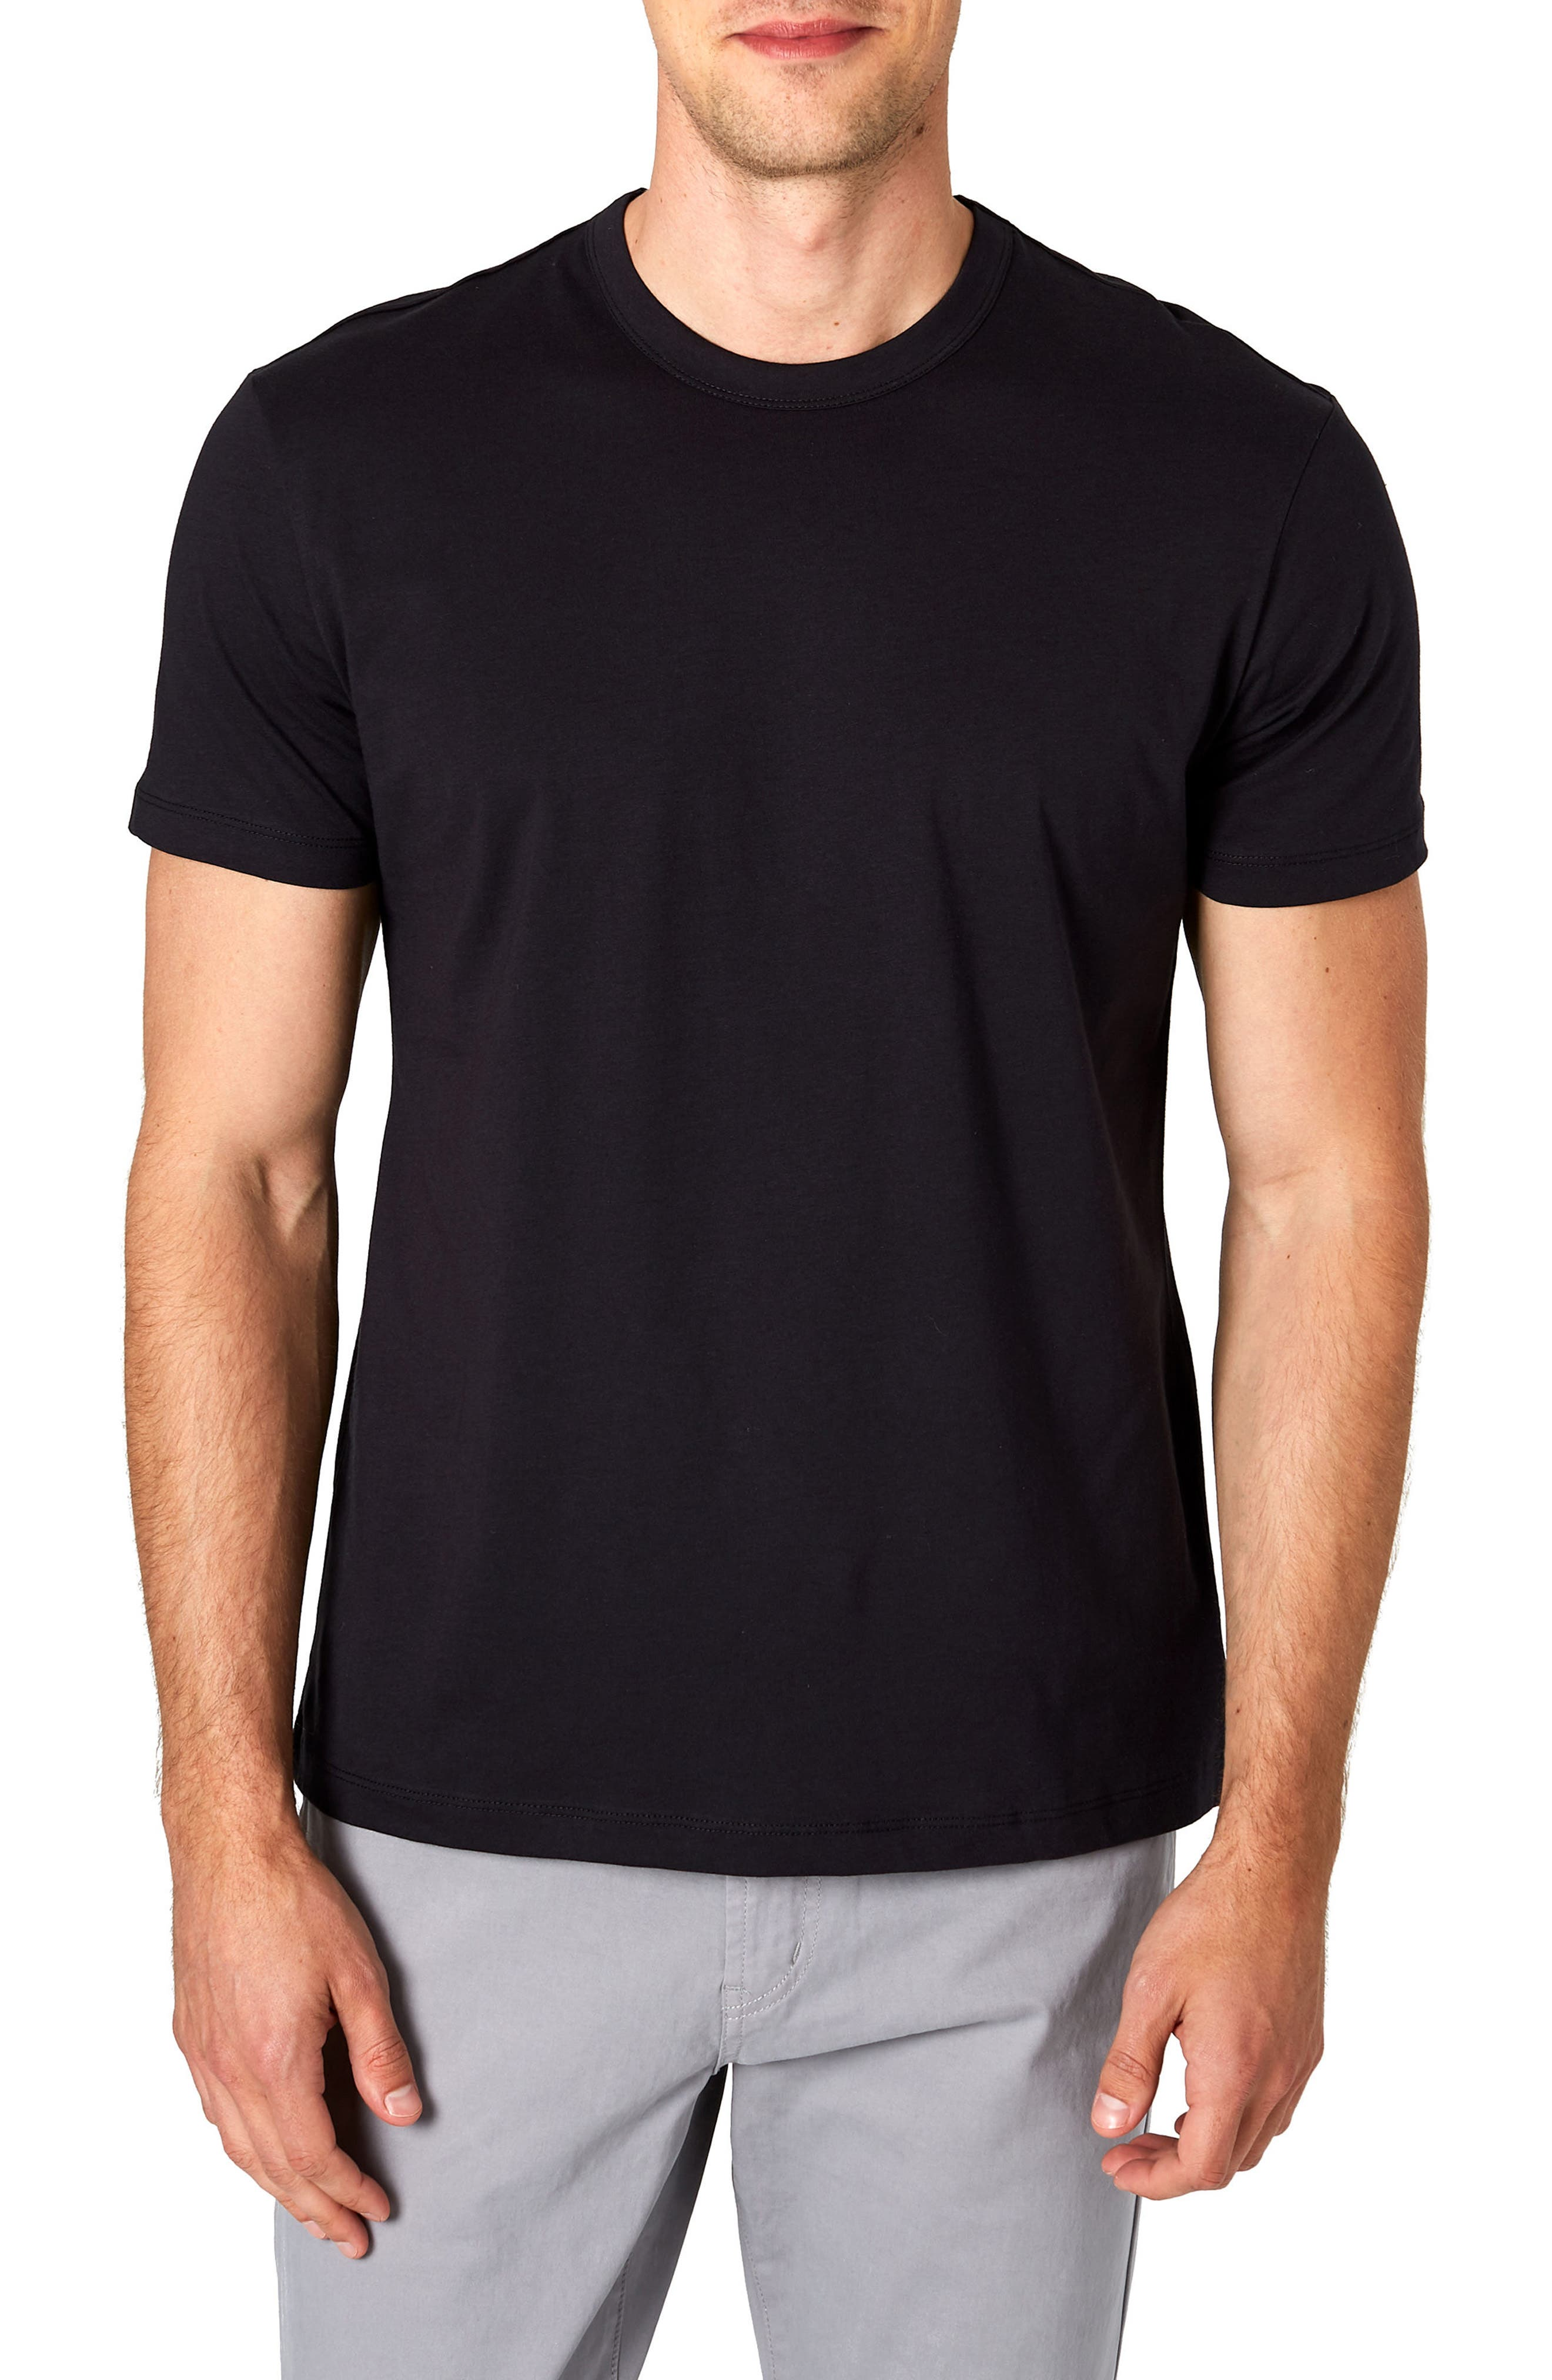 Iqonicq Crewneck T-Shirt,                             Main thumbnail 1, color,                             BLACK